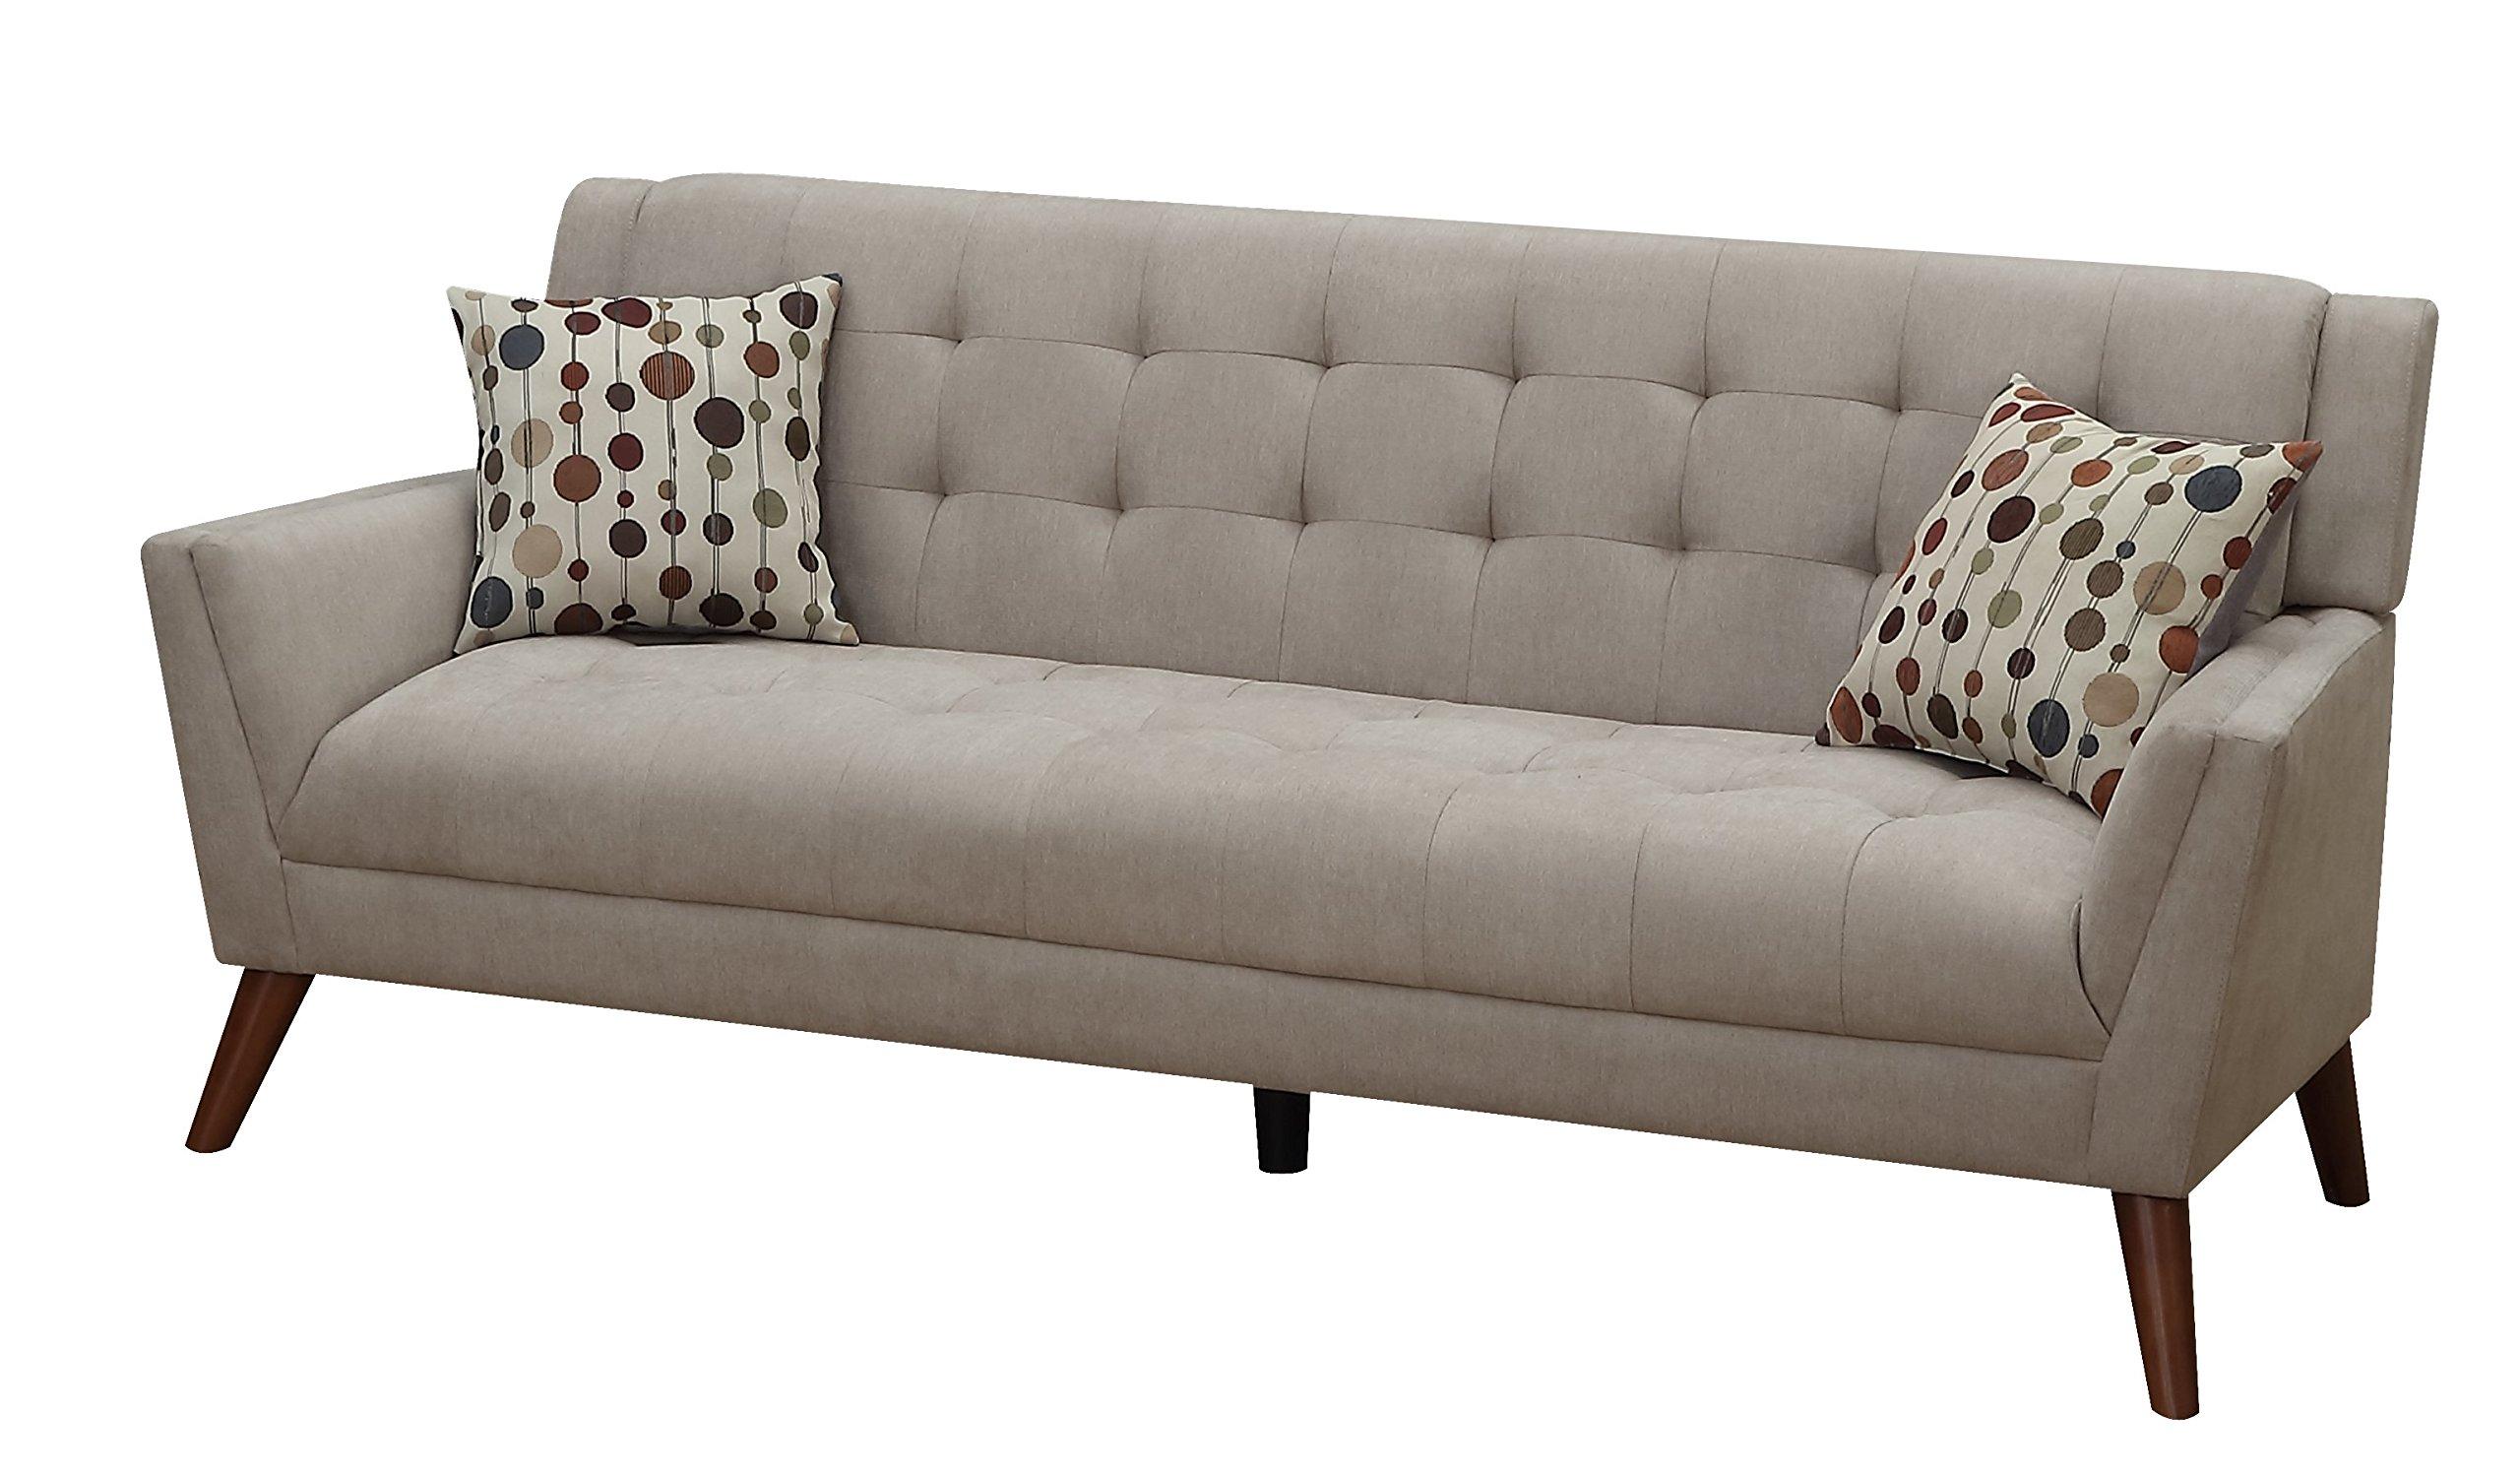 Furniture World Mid Century Sofa, Oatmeal